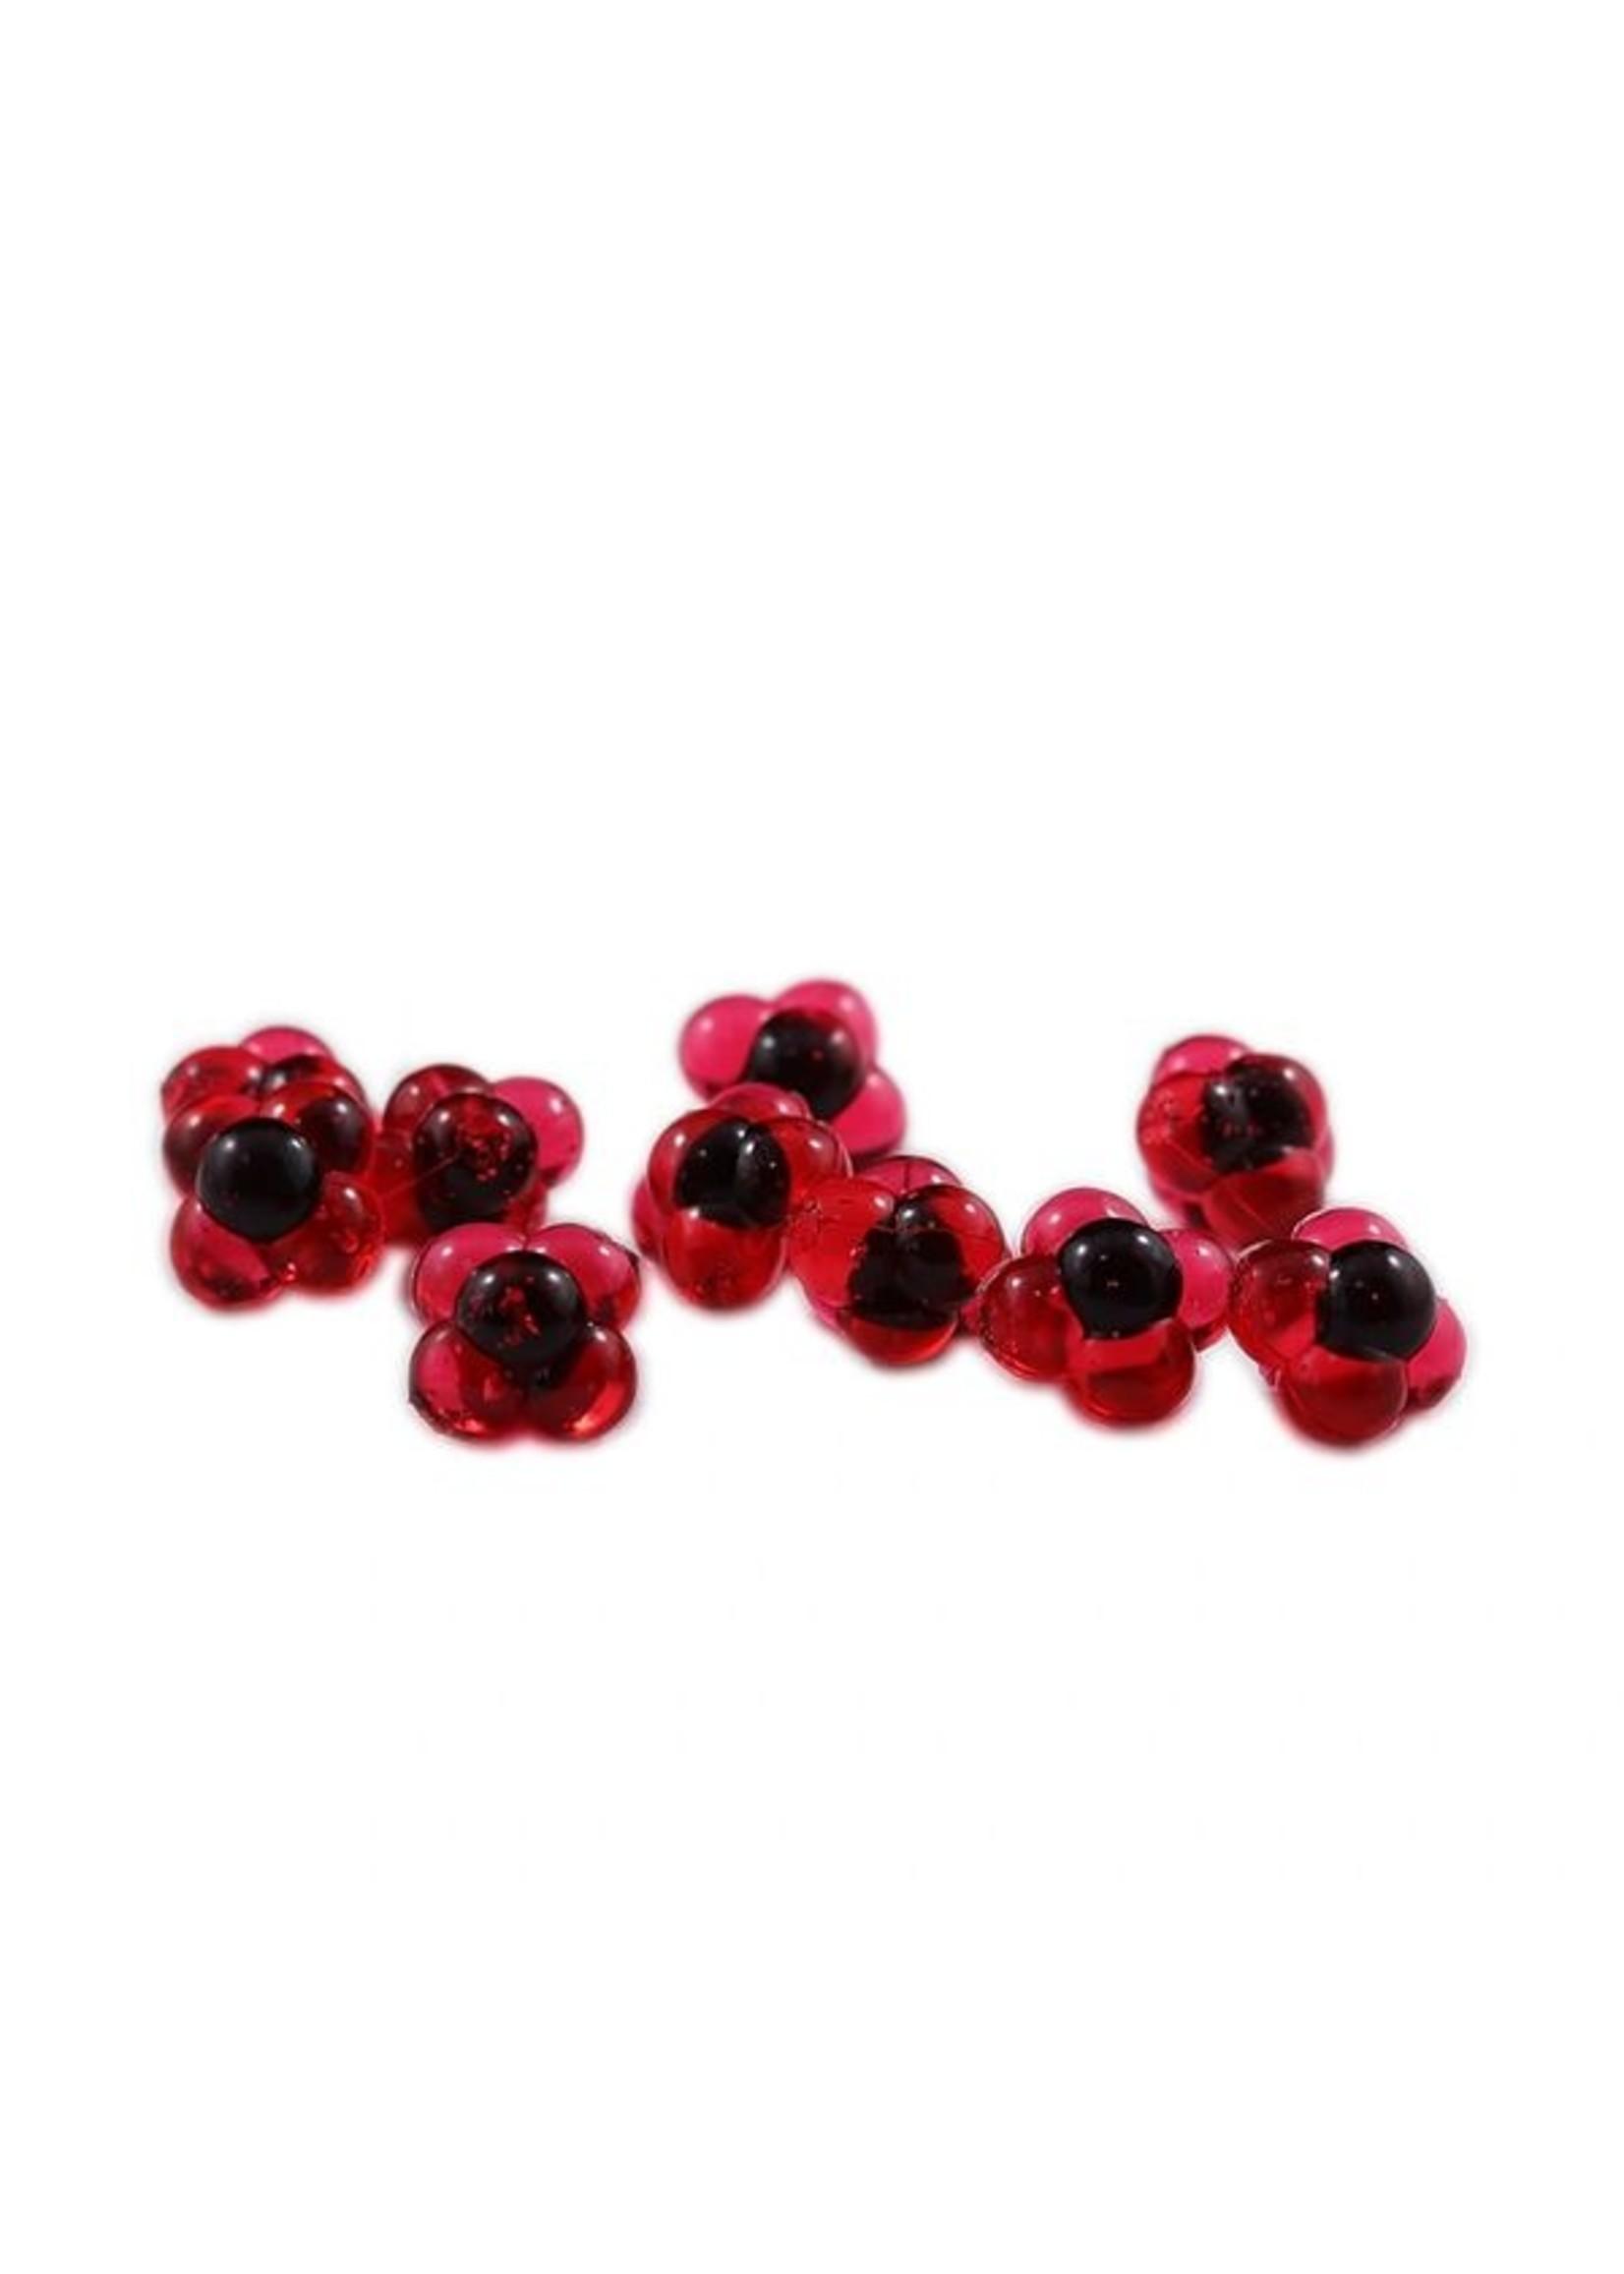 Cleardrift Cleardrift Embryo Egg Clusters Lg Cherry Red w/Blk Embryo